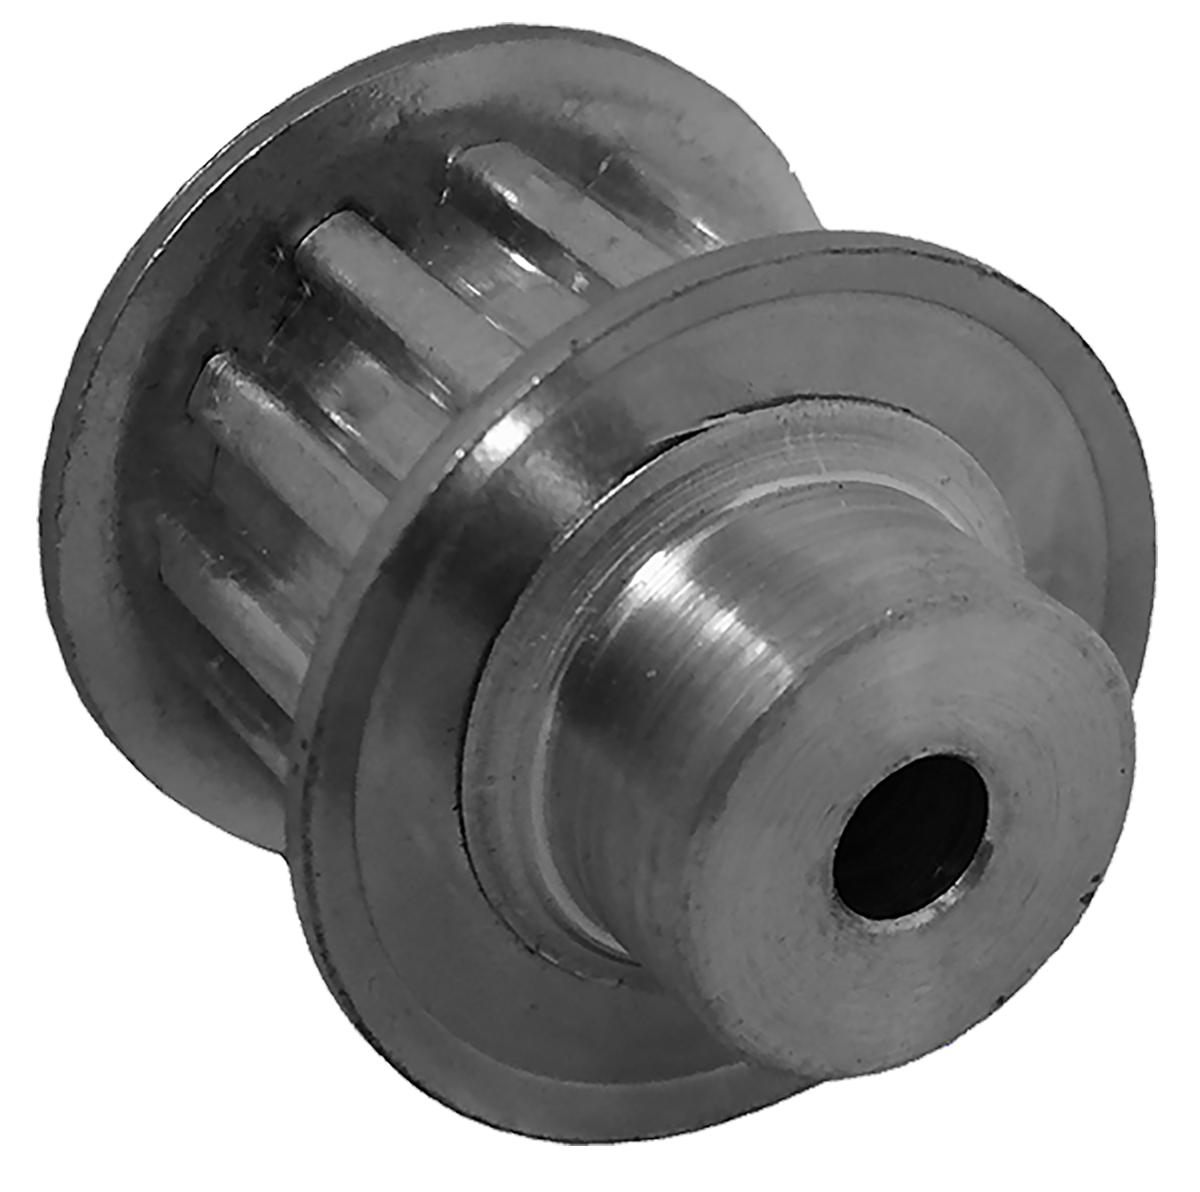 21T5/12-2 - Aluminum Metric Pulleys